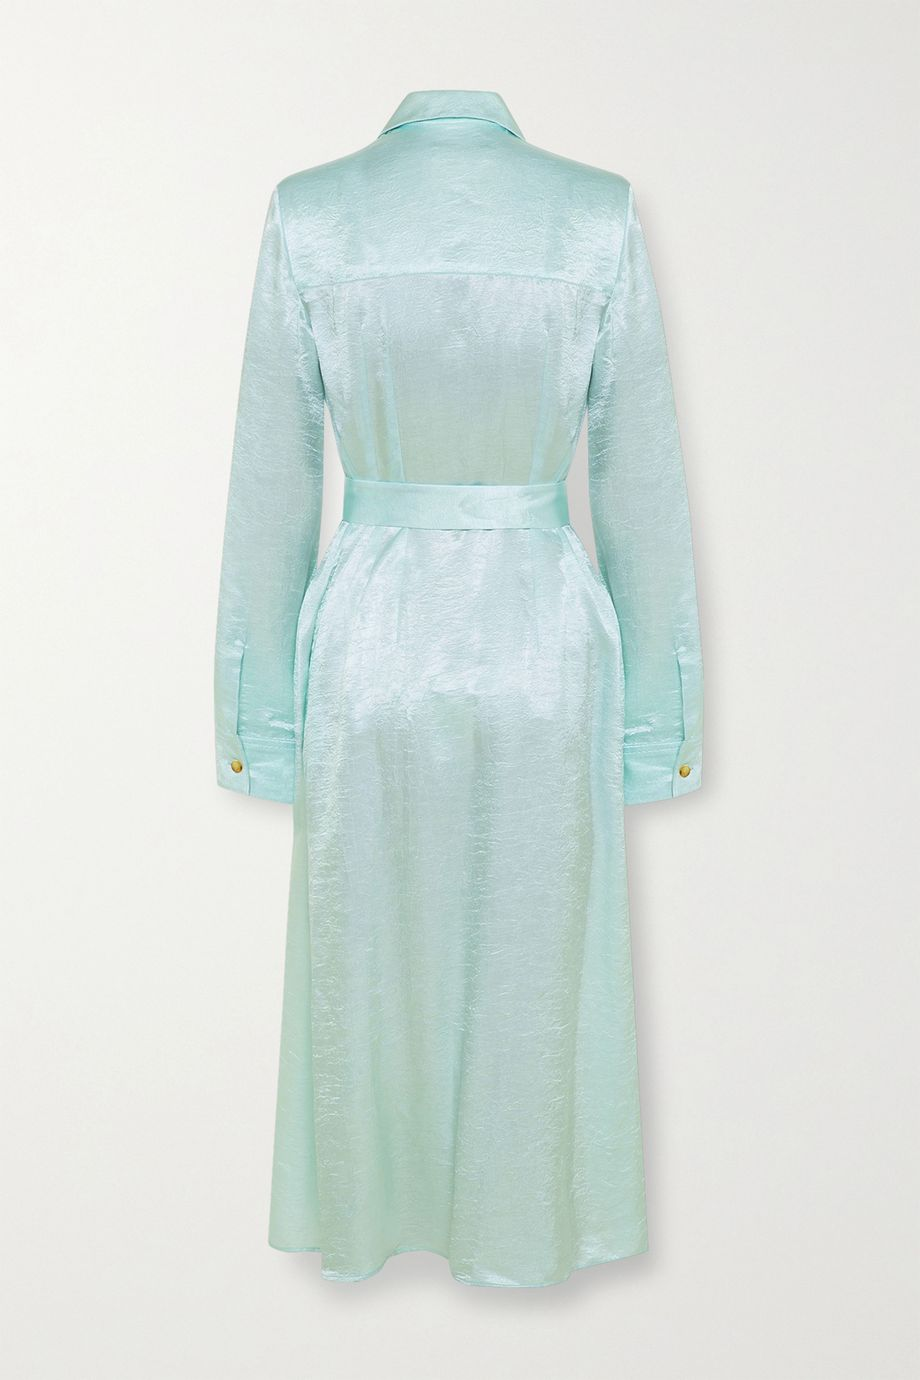 ANNA QUAN Adela 配腰带皱褶缎布中长衬衫式连衣裙